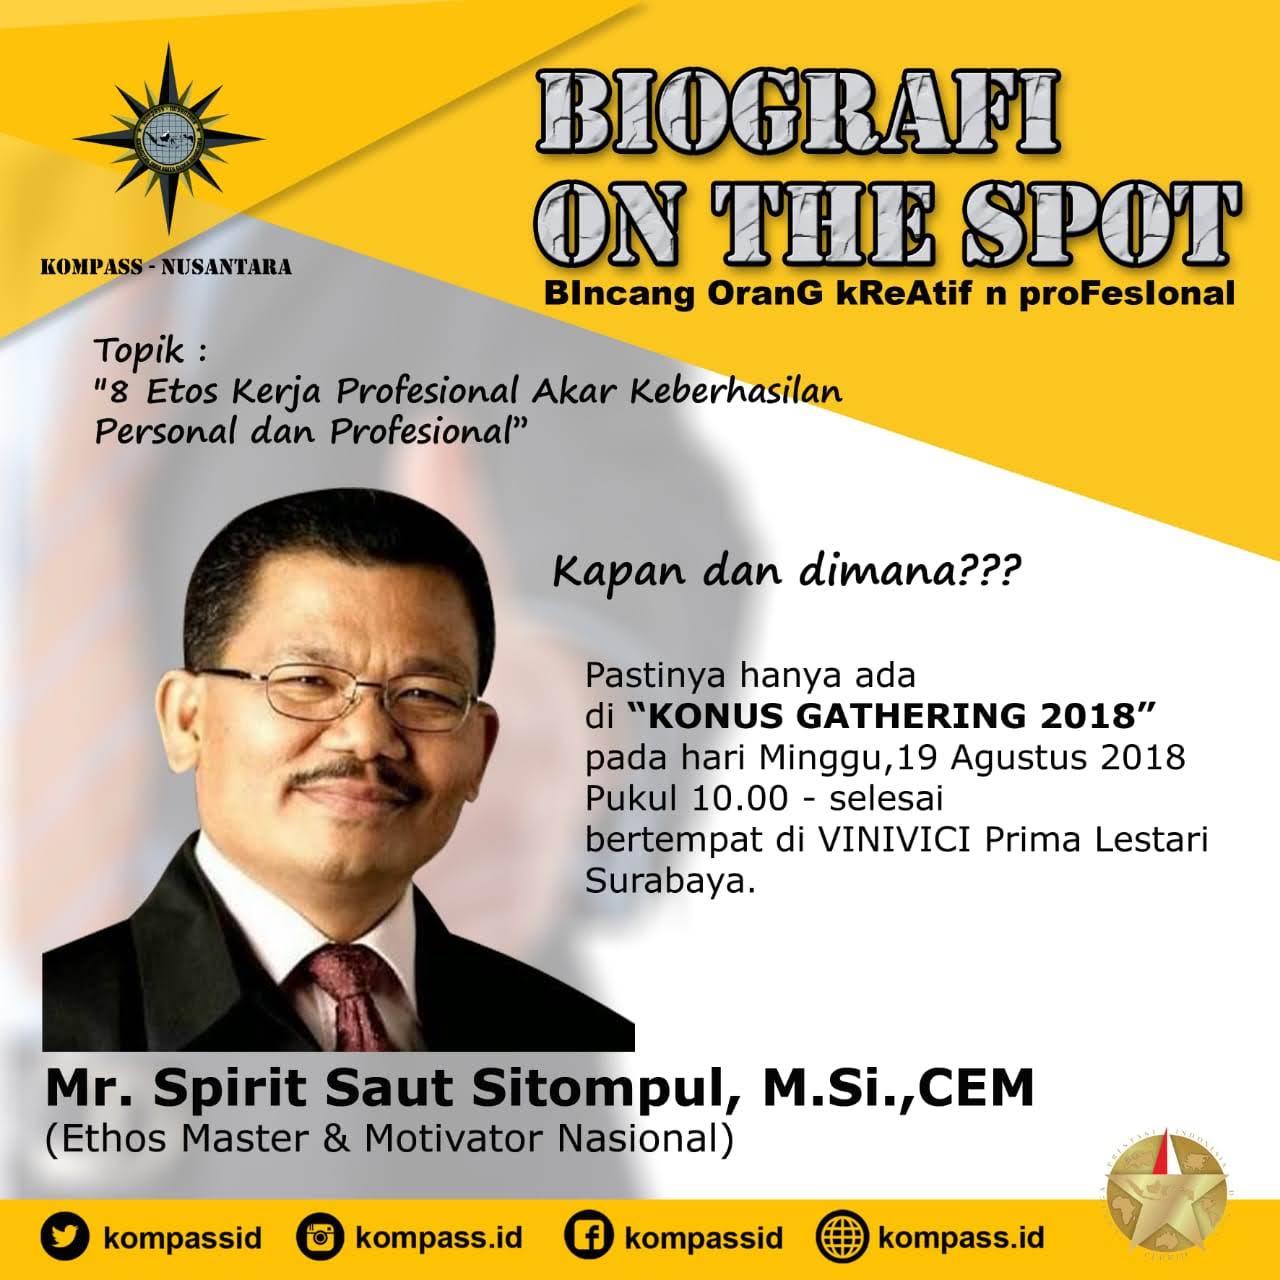 Biografi On The Spot oleh Saut Sitompul Guru ETOS Indonesia